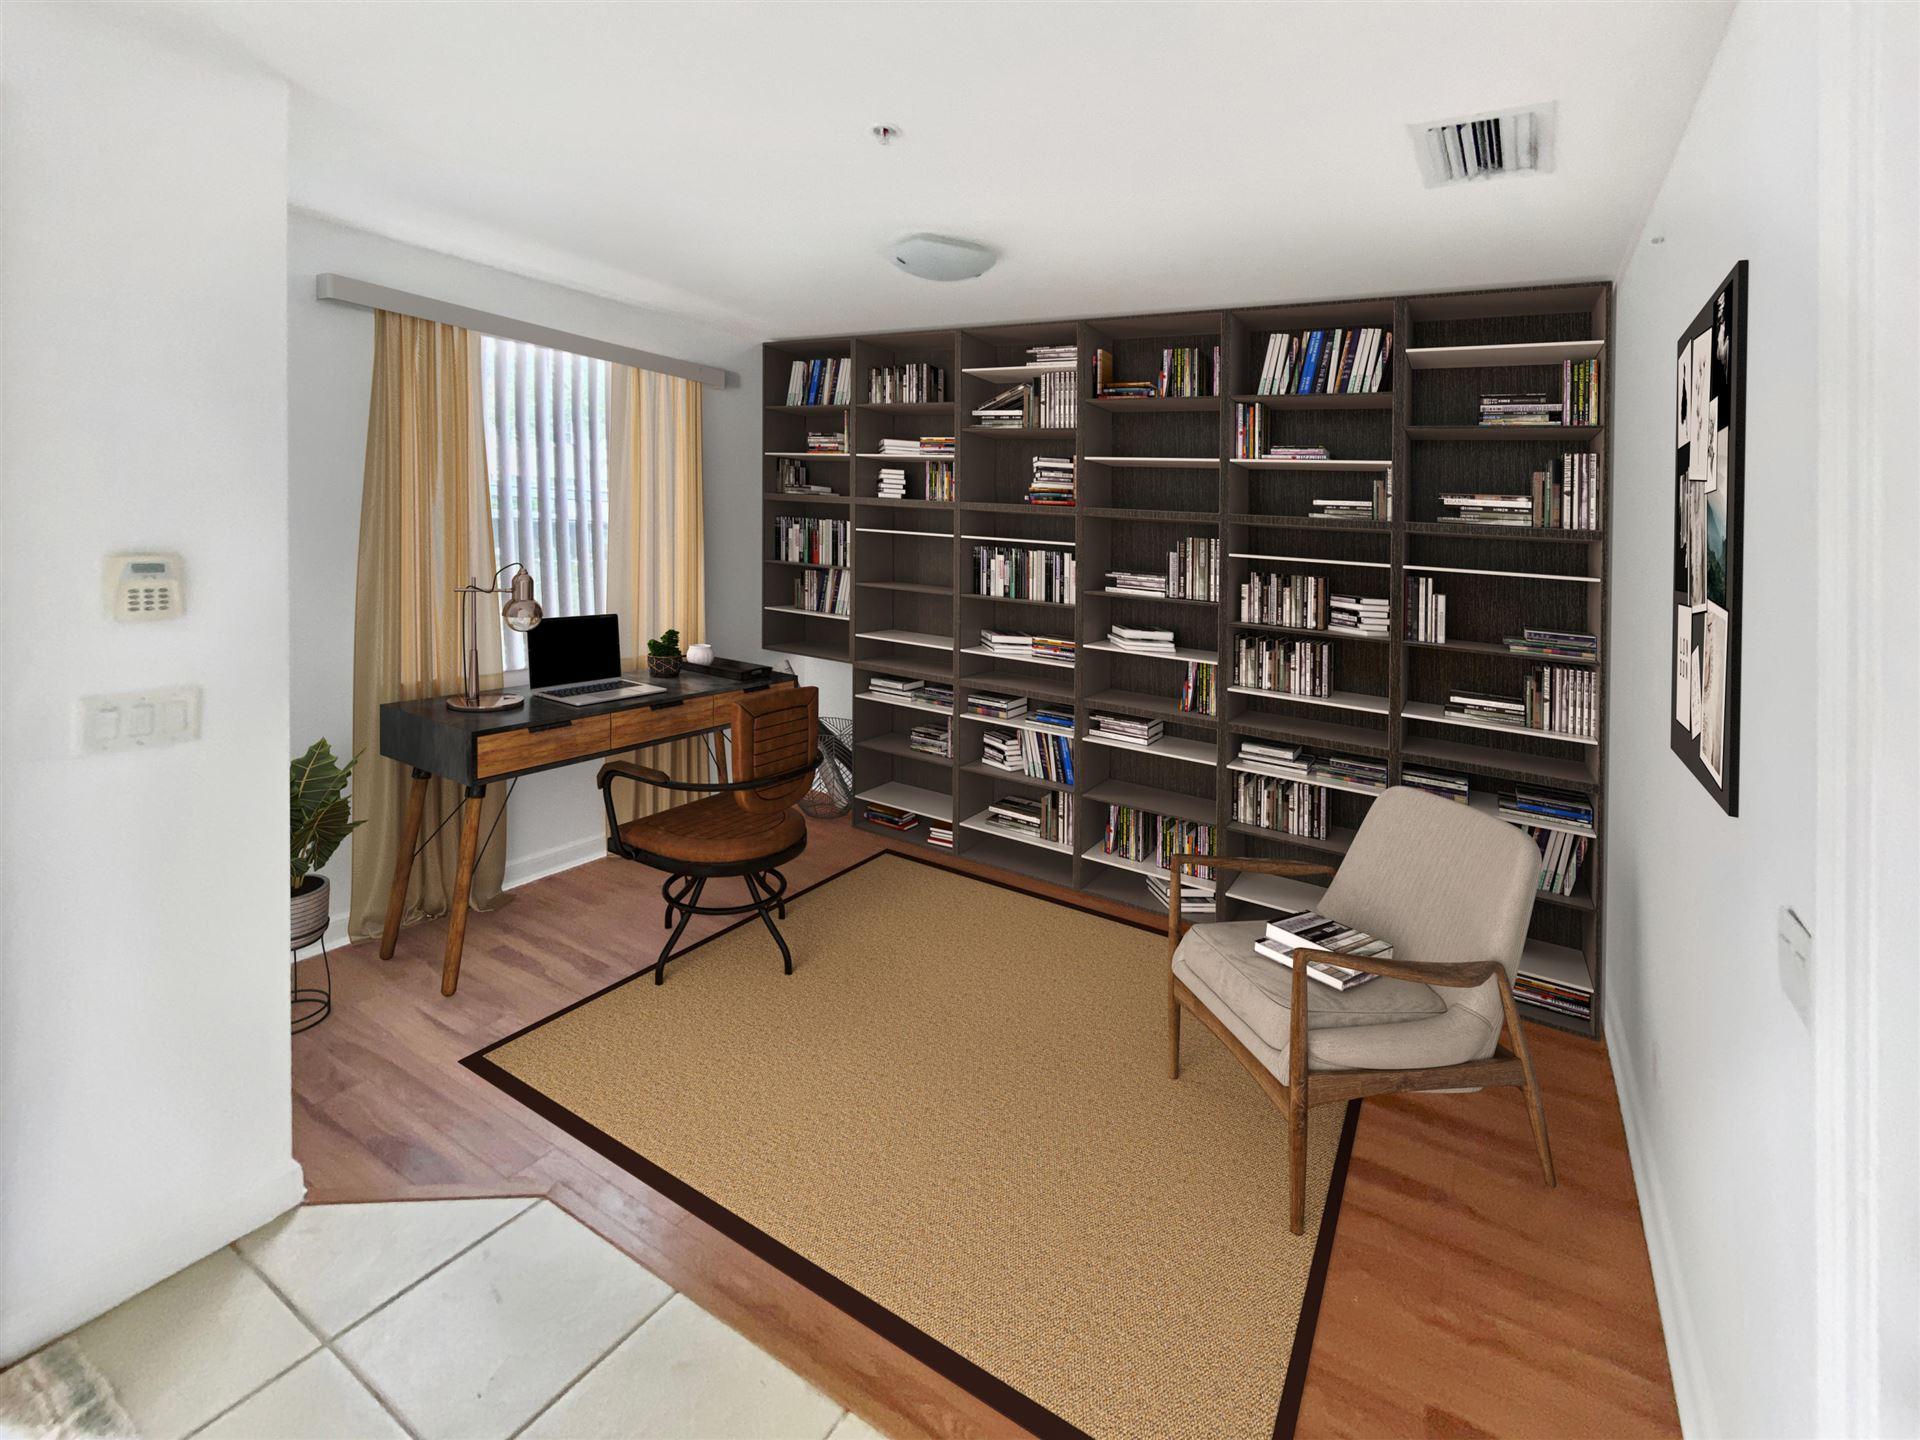 441 Amador Lane #4, West Palm Beach, FL 33401 - #: RX-10665887